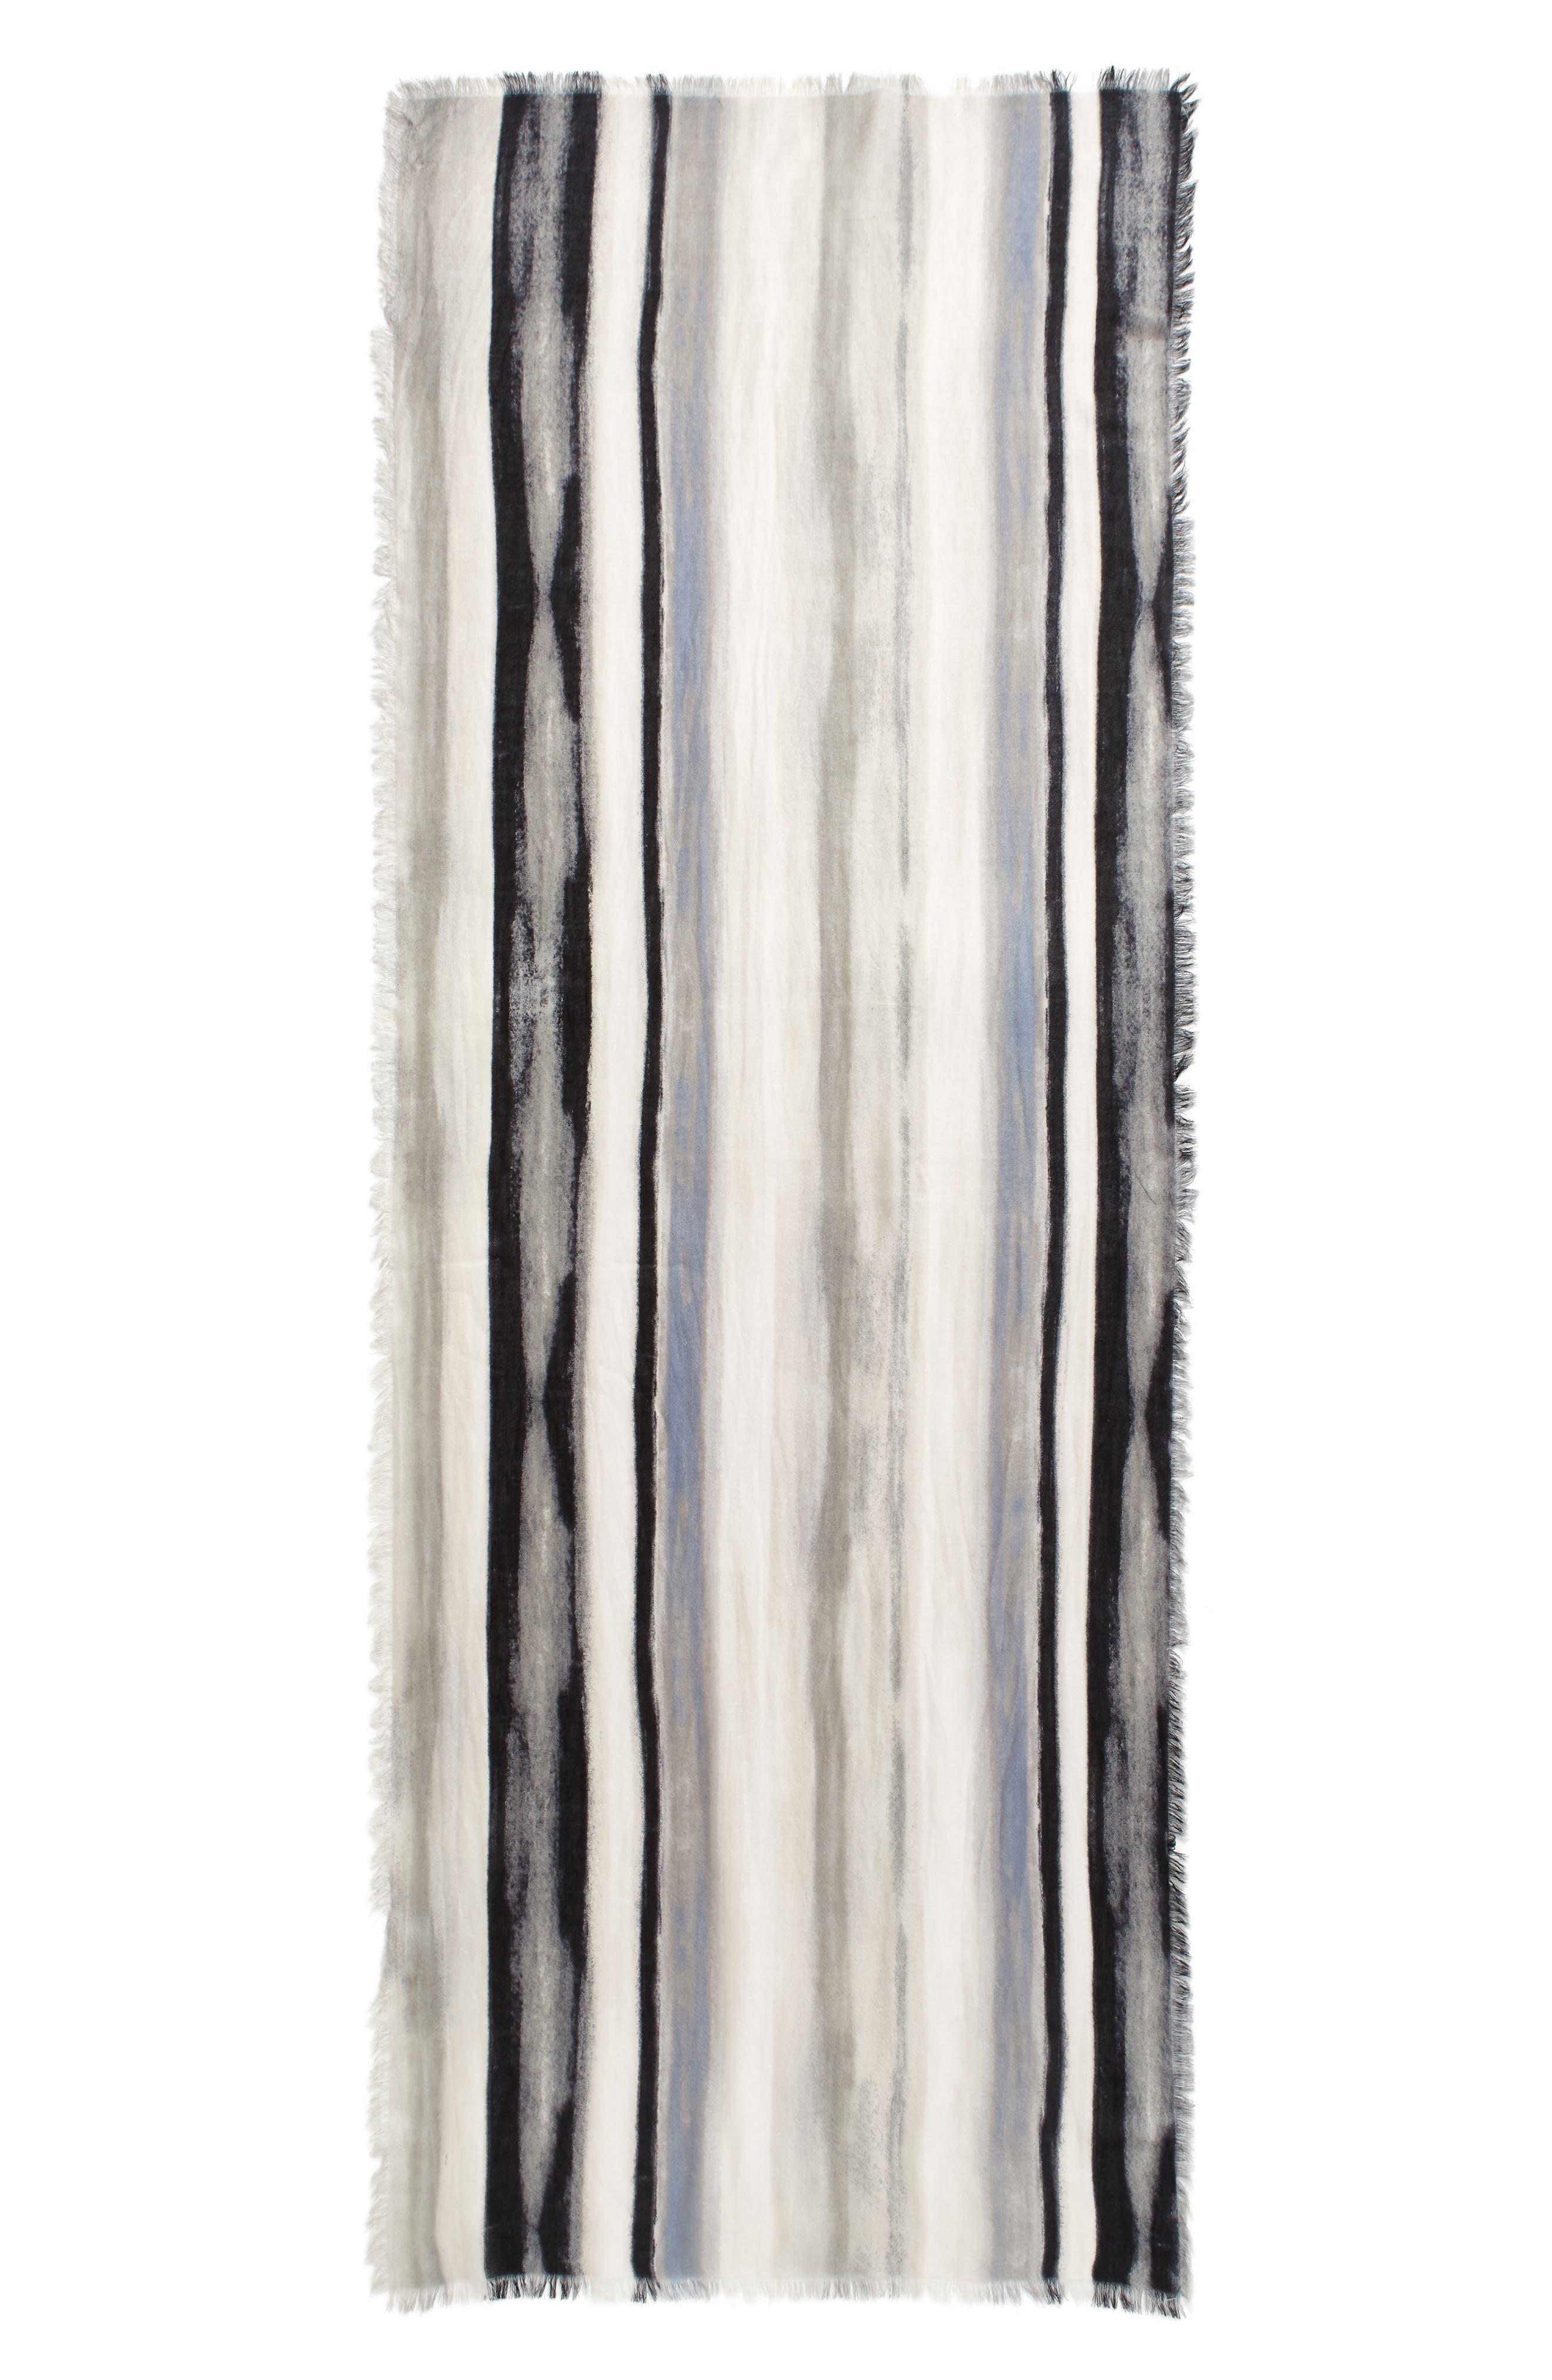 NORDSTROM,                             Artist Ombré Cashmere & Silk Scarf,                             Alternate thumbnail 2, color,                             030